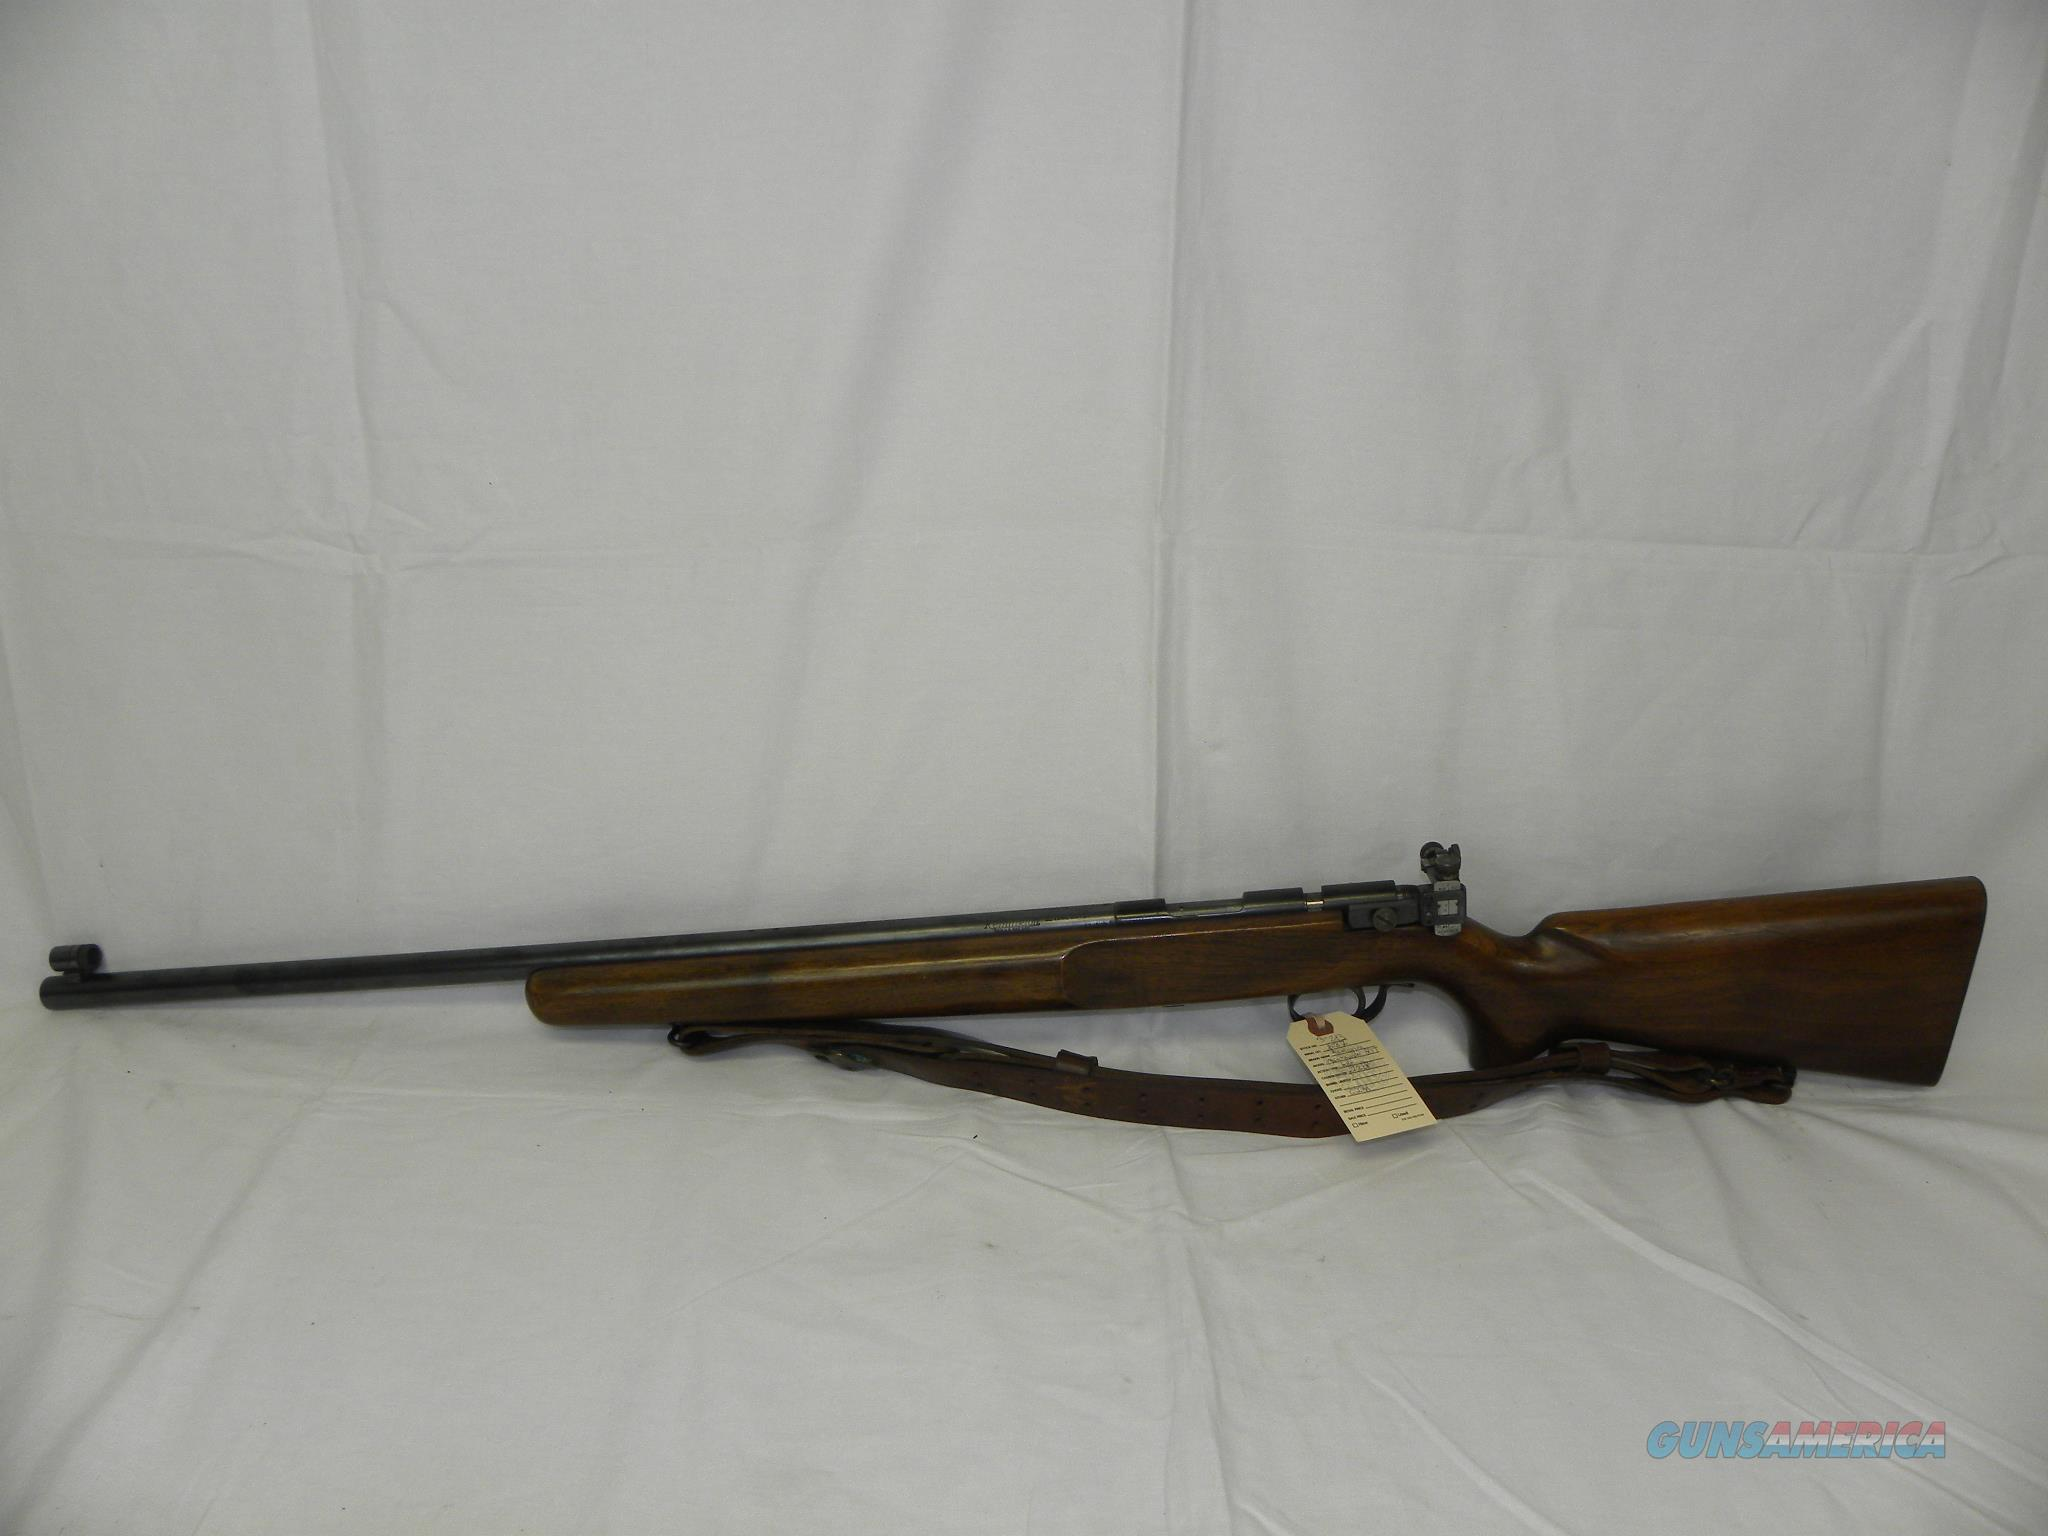 Remington Matchmaster 513-T  Guns > Rifles > Remington Rifles - Modern > .22 Rimfire Models